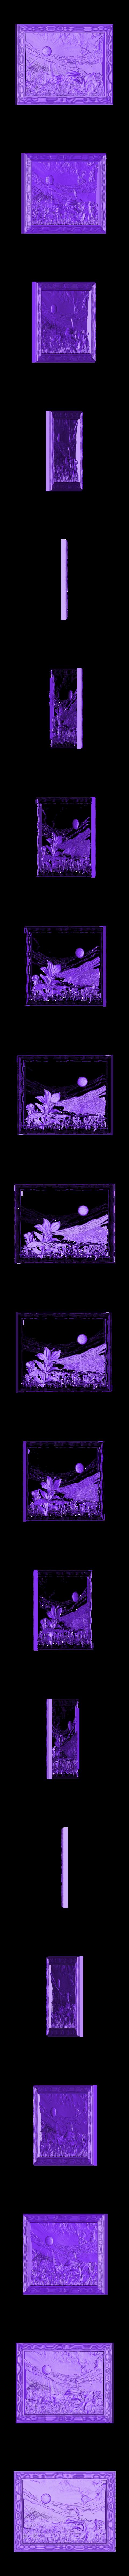 928. Panno.stl Download free STL file Flowers • 3D printable object, stl3dmodel